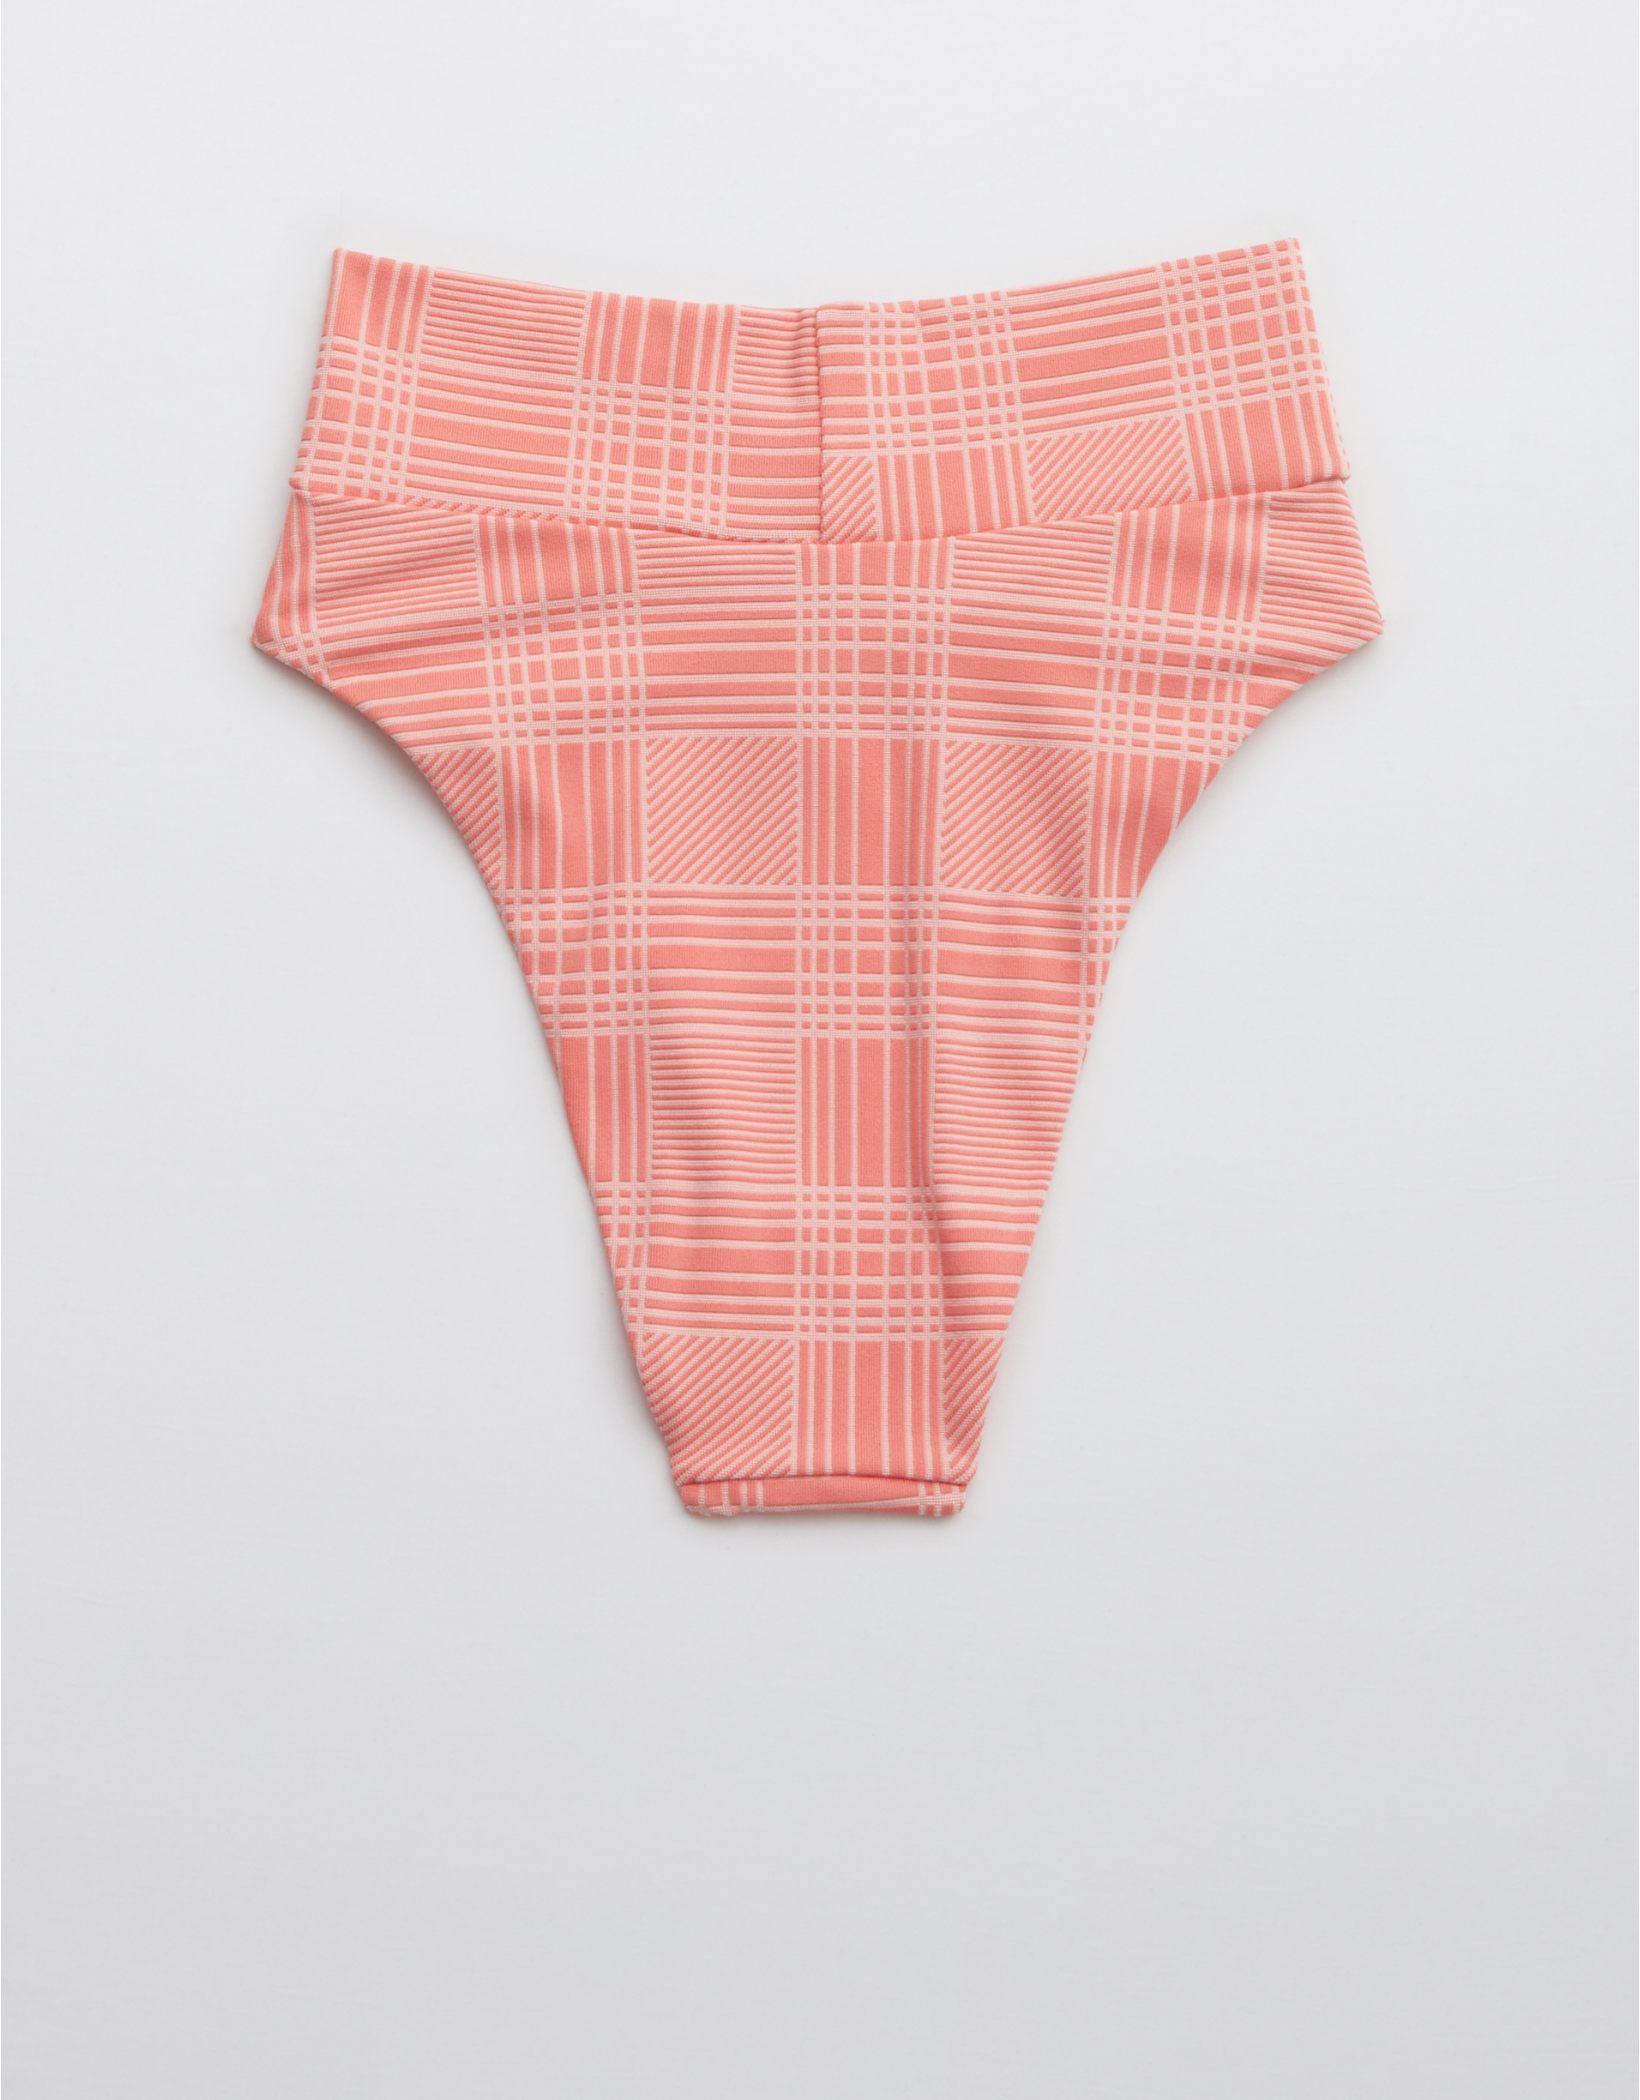 Aerie Jacquard Crossover High Cut Cheeky Bikini Bottom